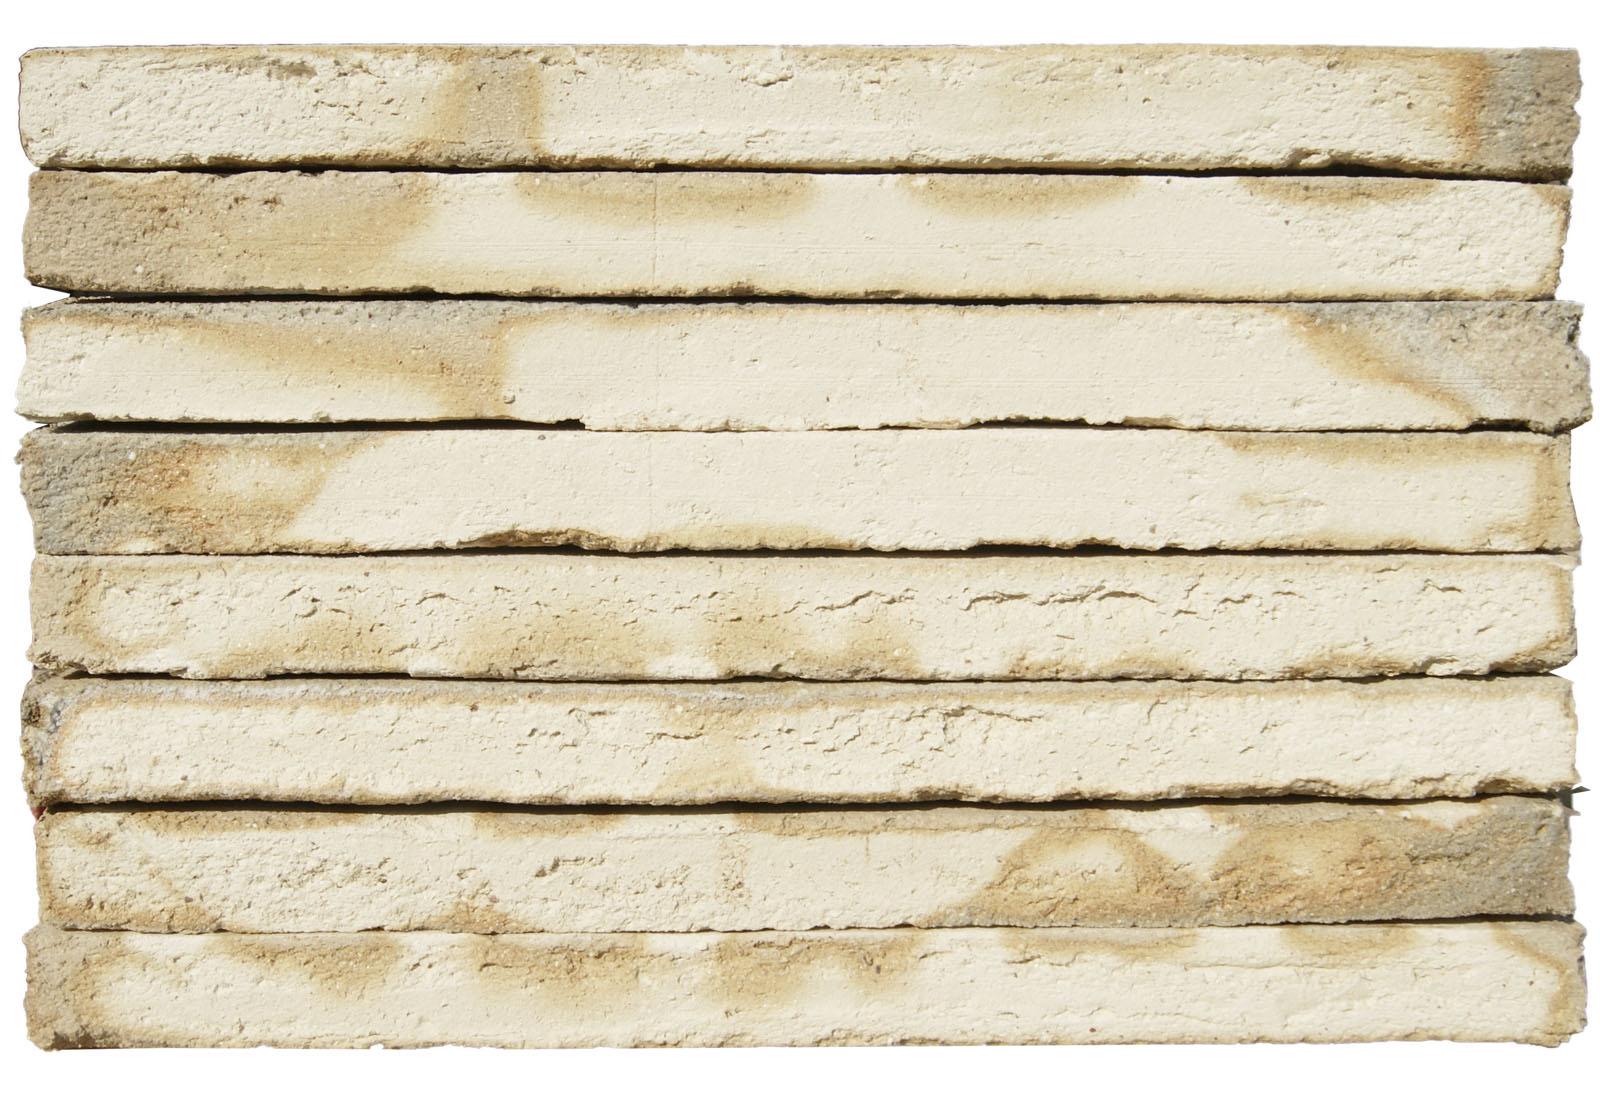 Ladrillos Superlargo Manual Blanco Marfil Destonado